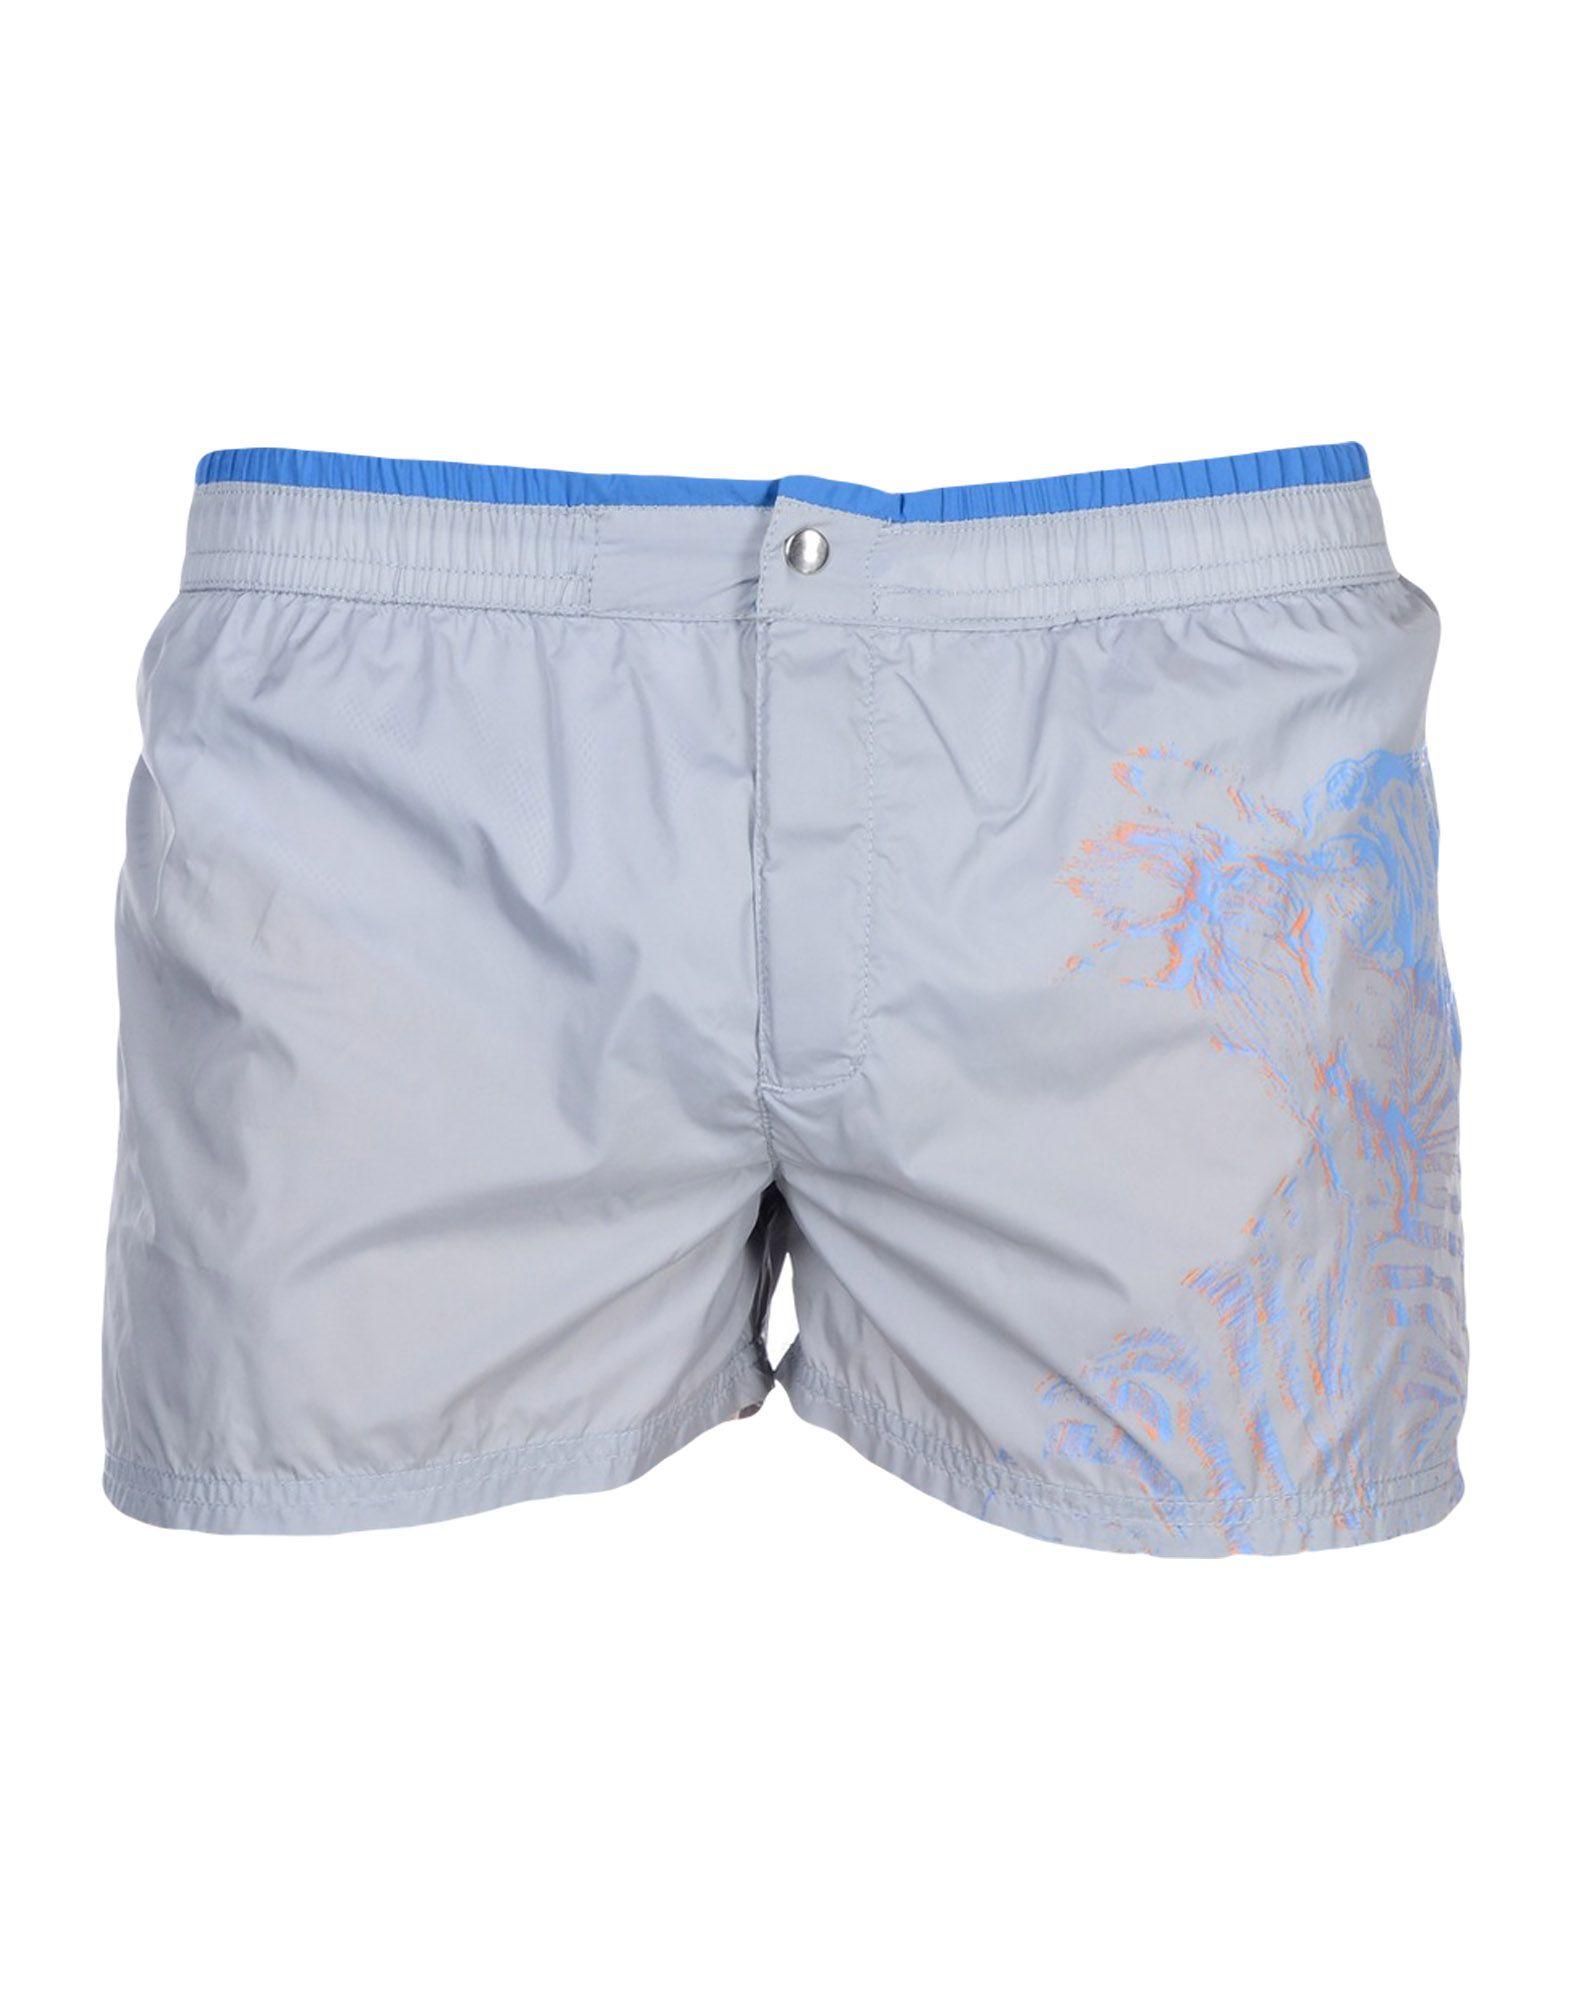 JUST CAVALLI BEACHWEAR Шорты для плавания just cavalli beachwear шорты для плавания